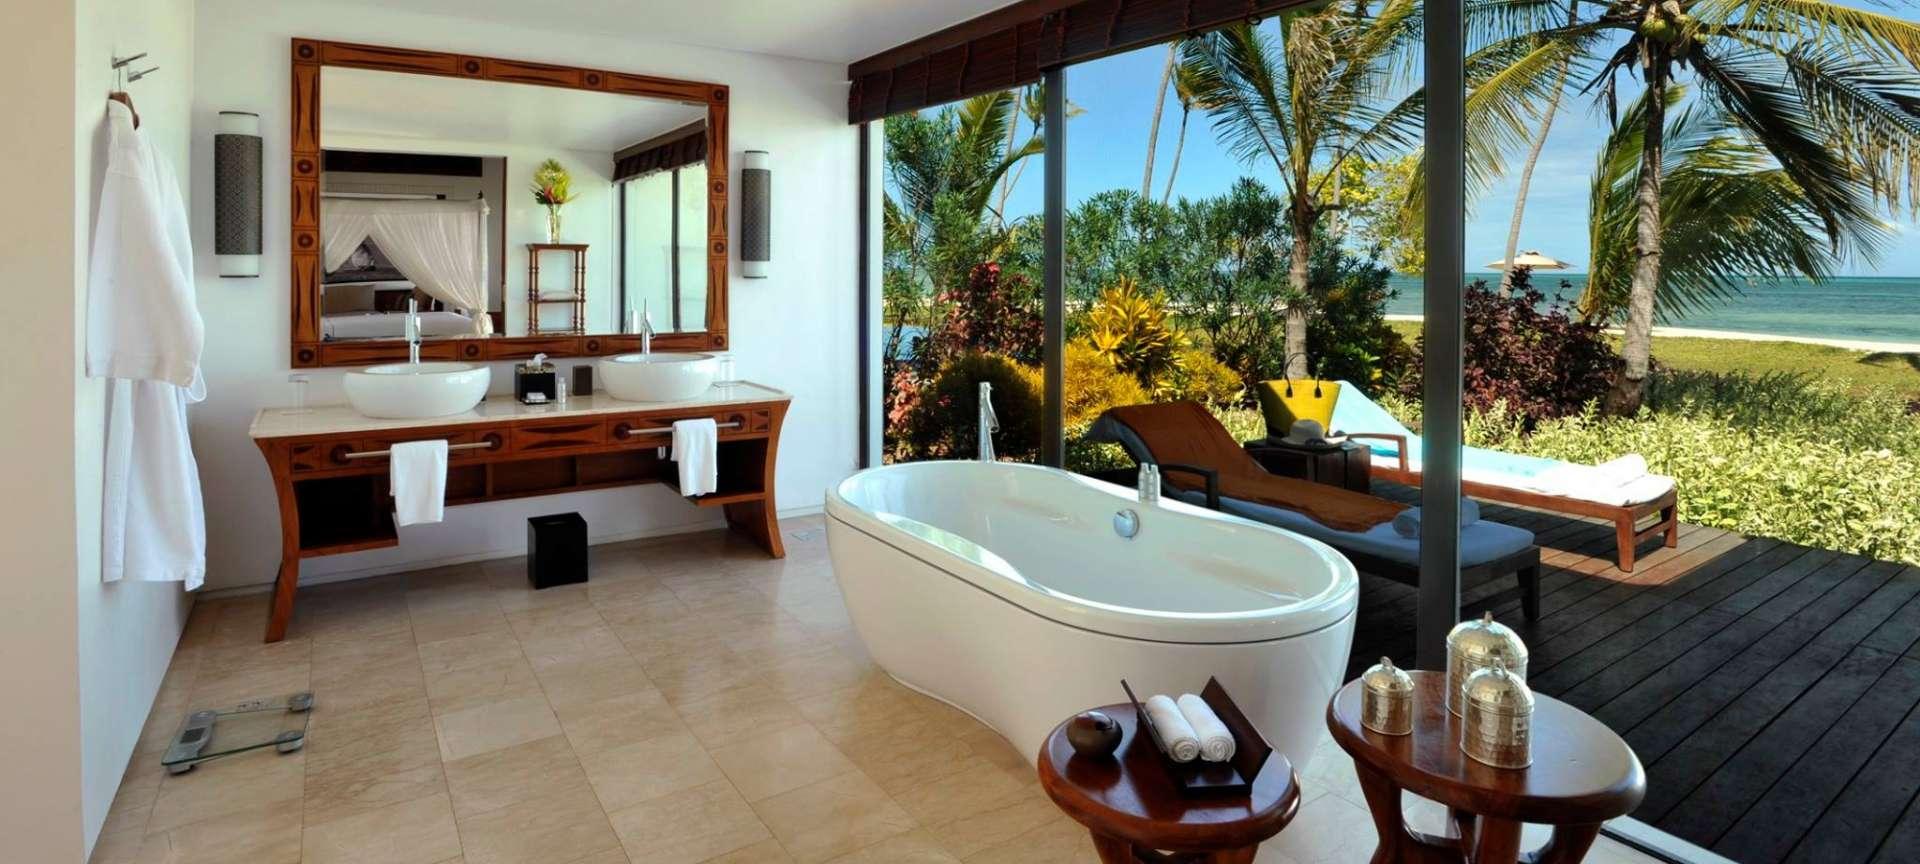 The Residence in Zanzibar is a luxurious 32 ha estate